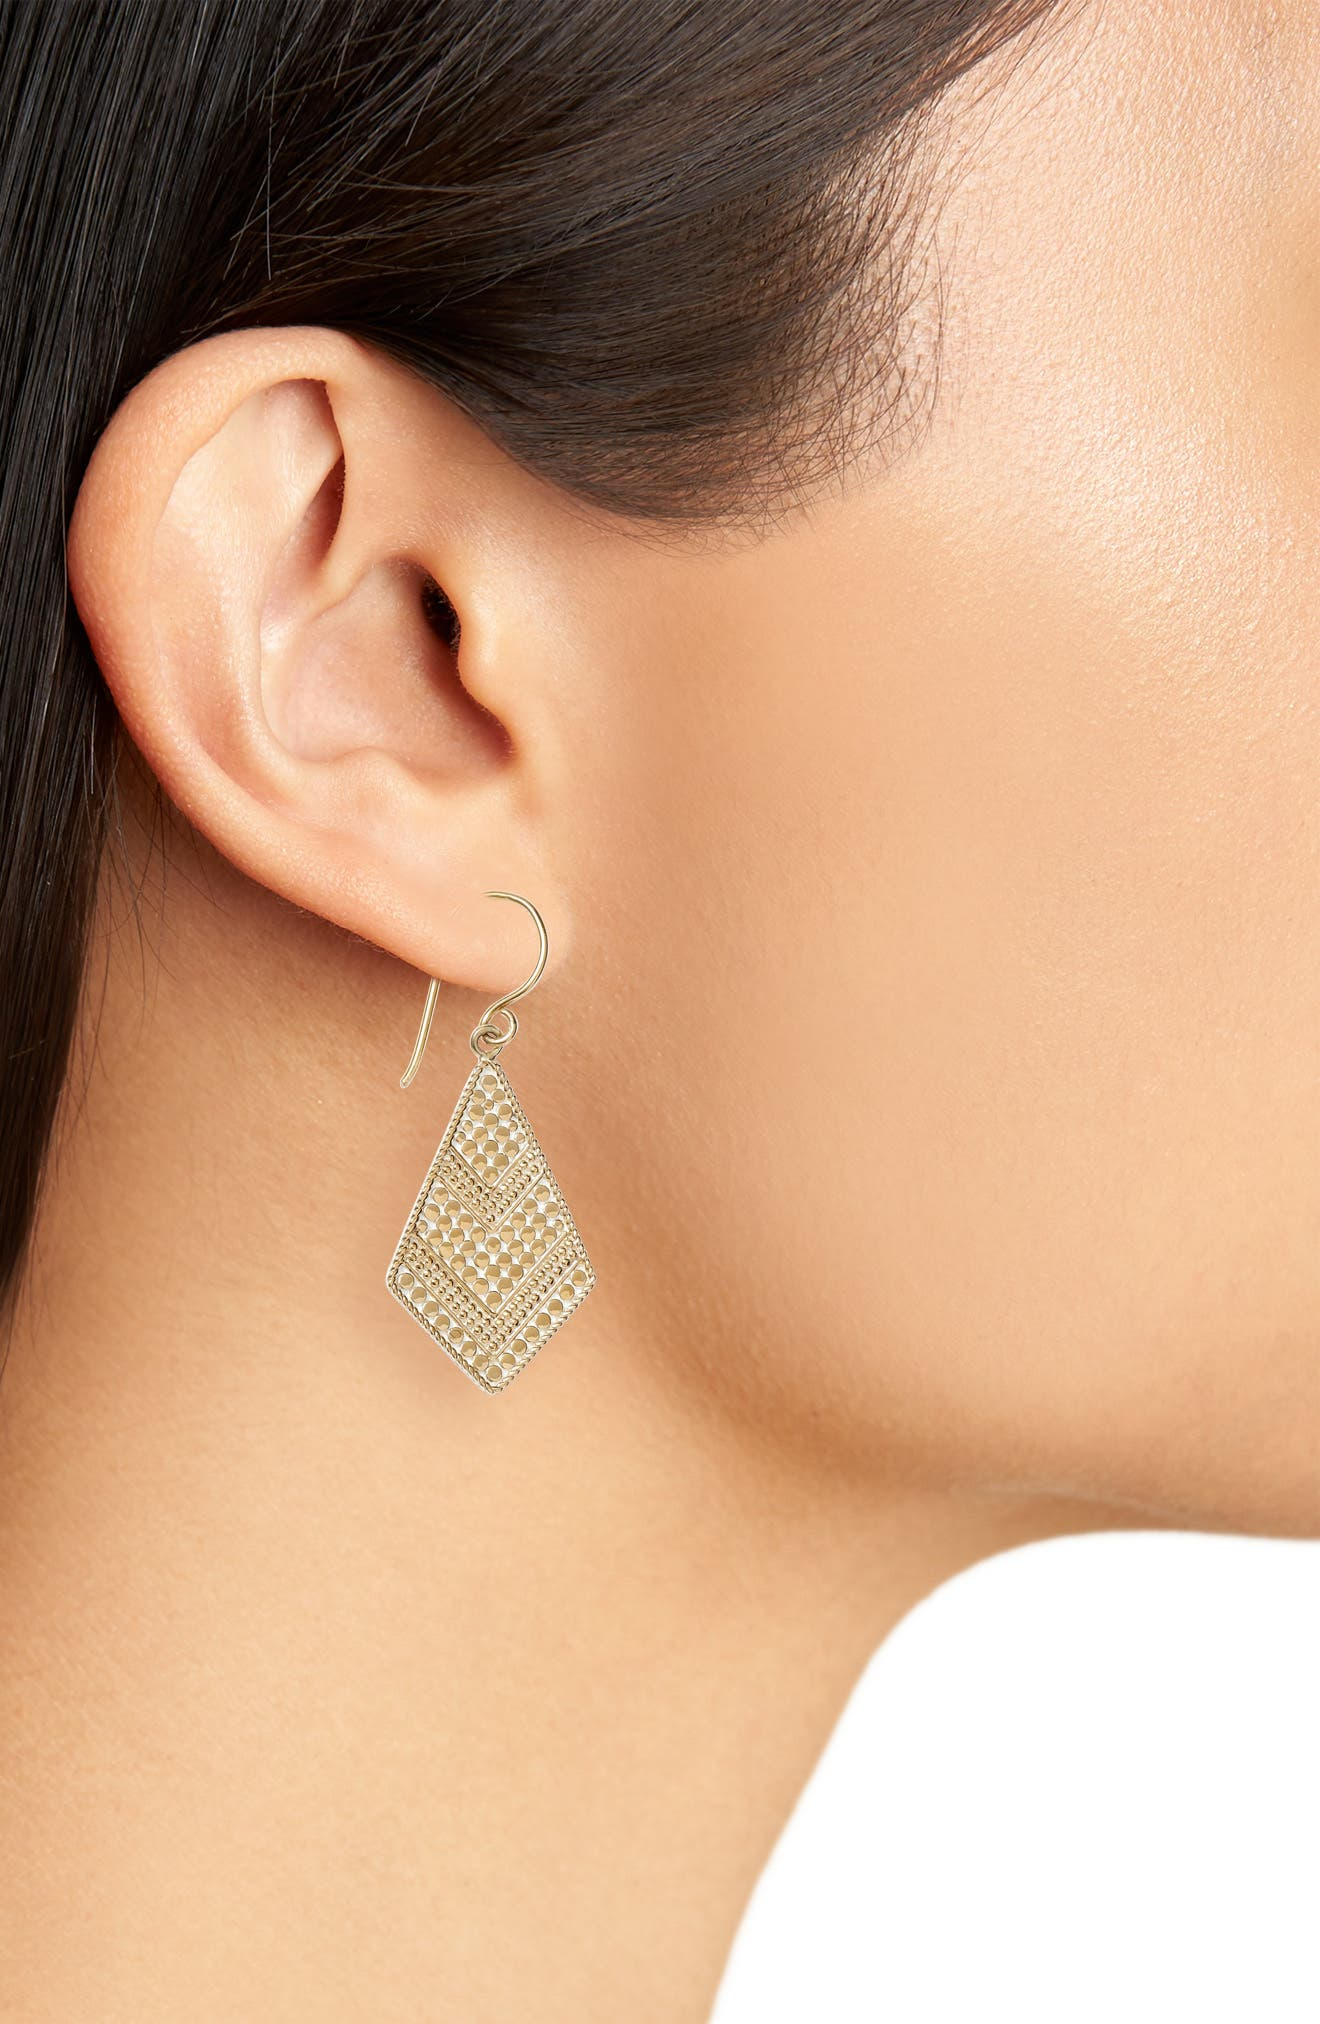 Gold Kite Drop Earrings,                             Alternate thumbnail 2, color,                             710